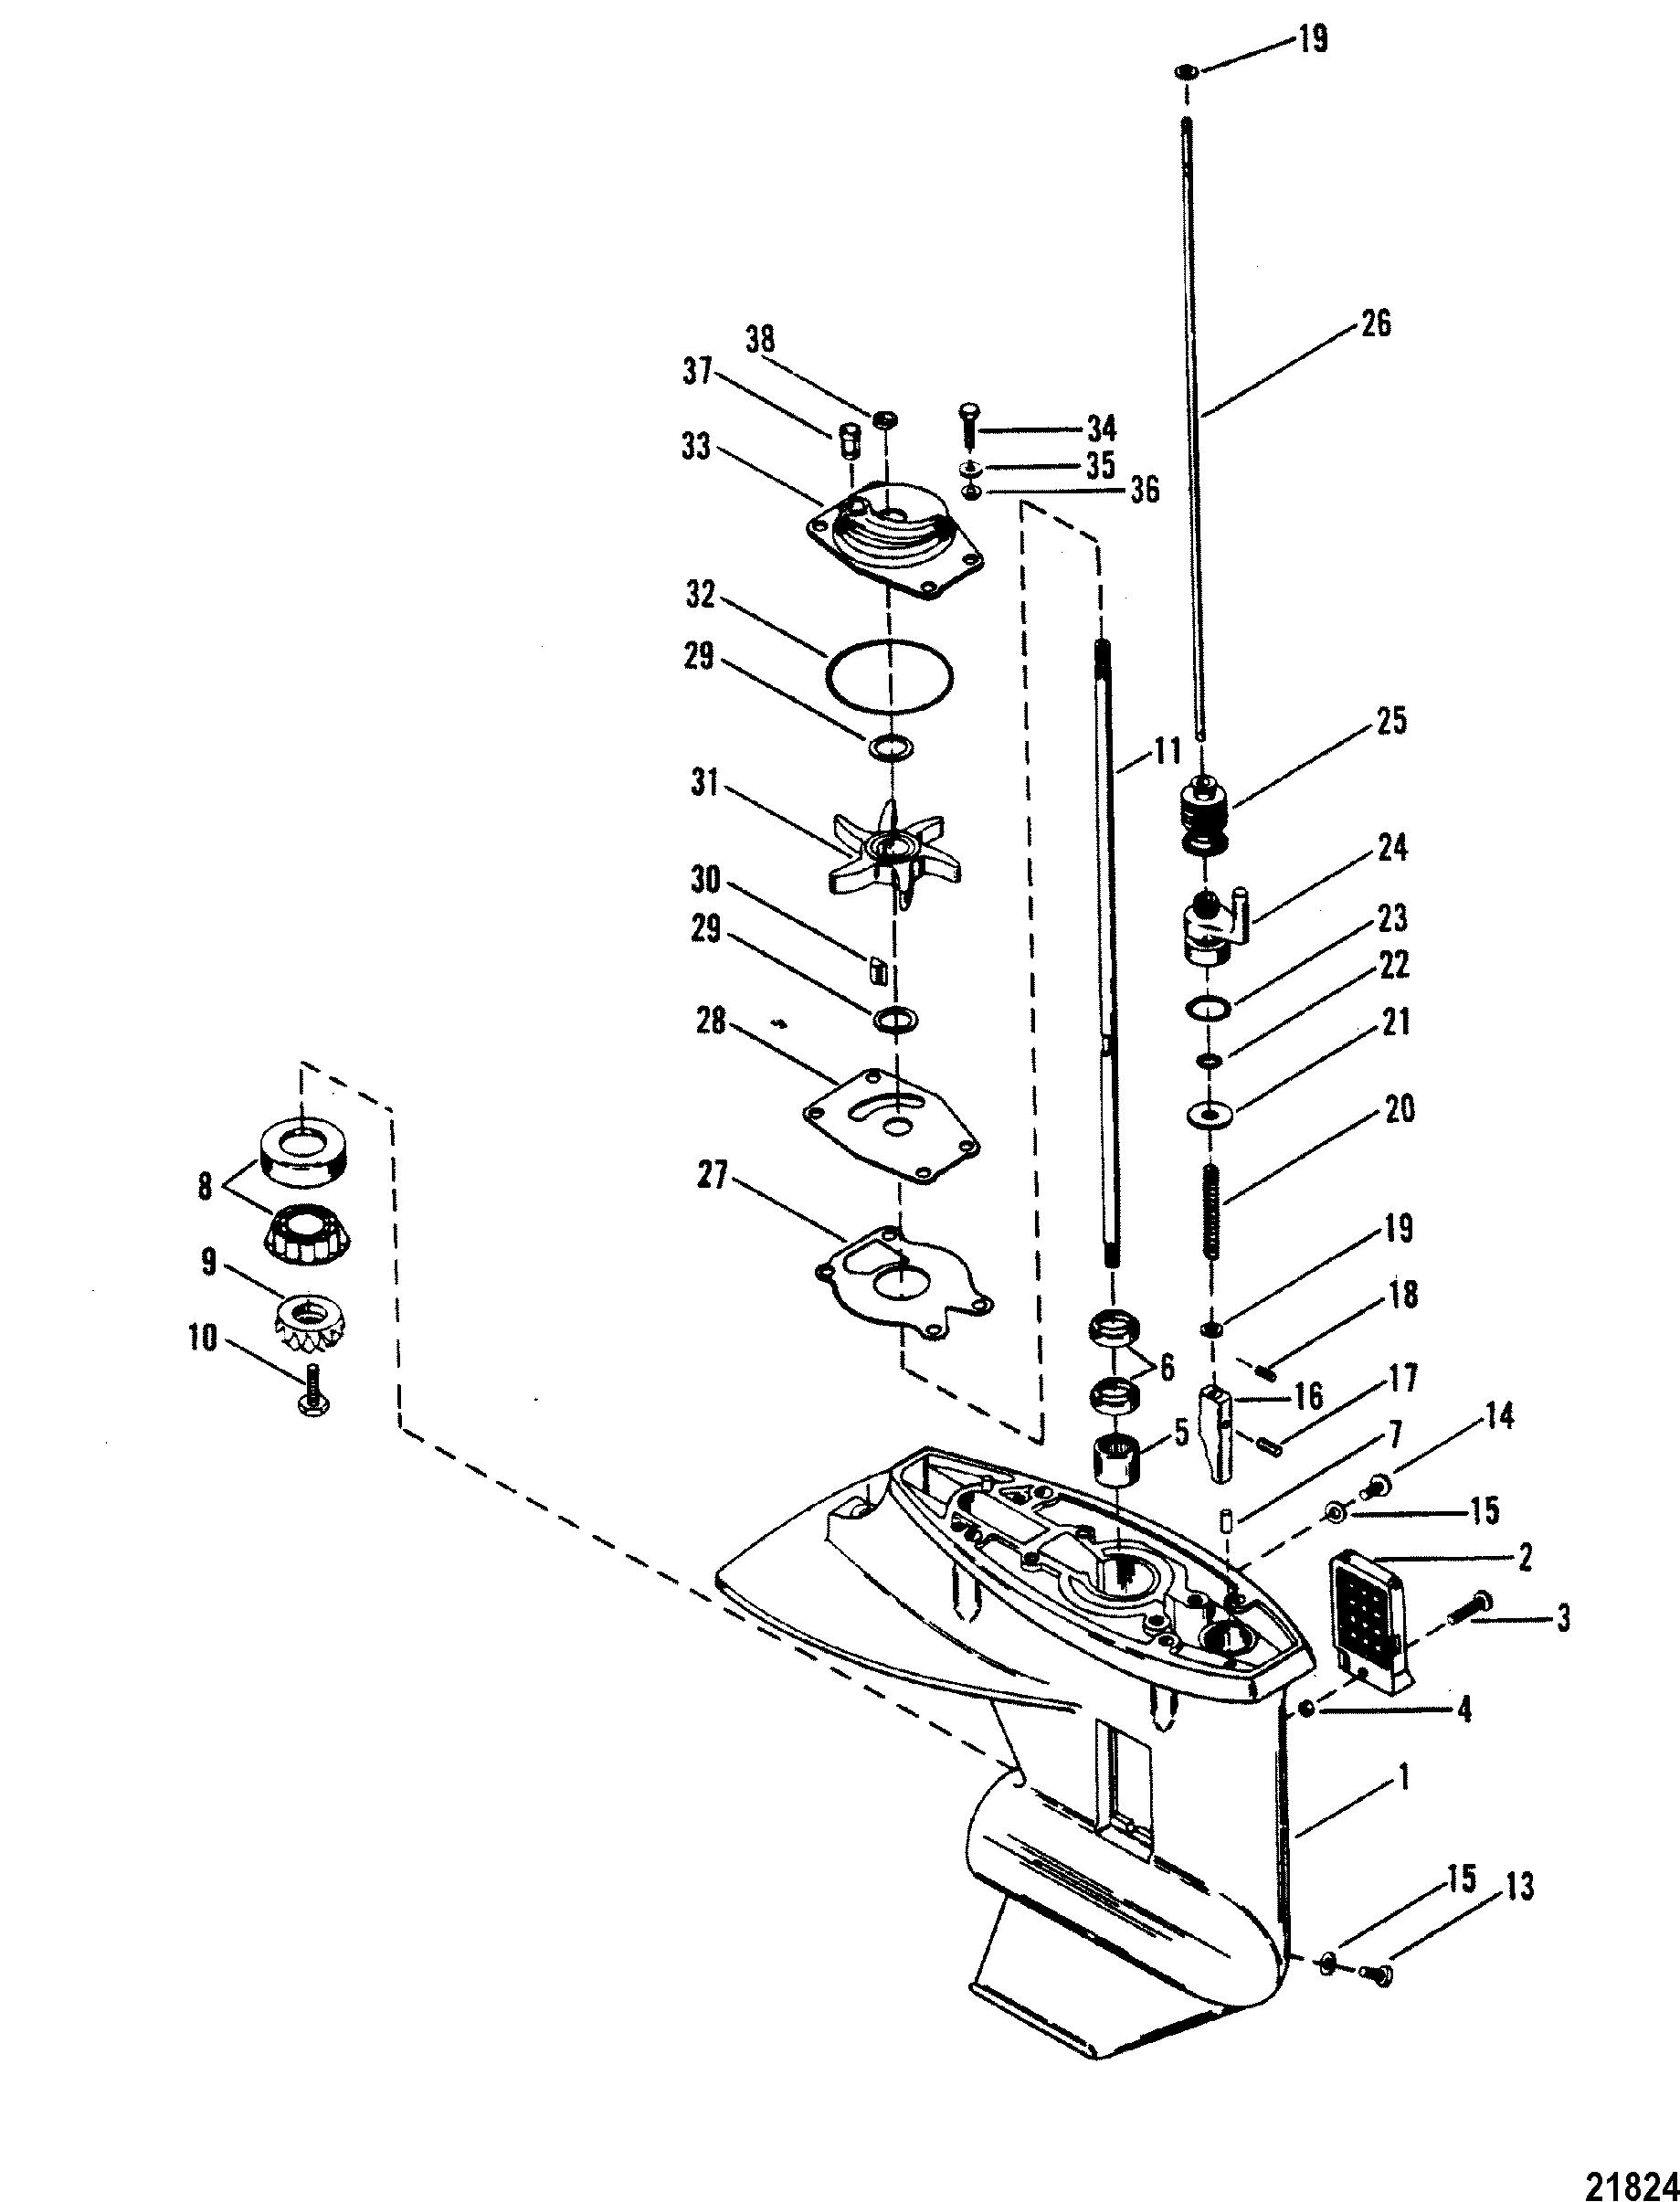 gear housing driveshaft for mariner    mercury 20 h p   25 h